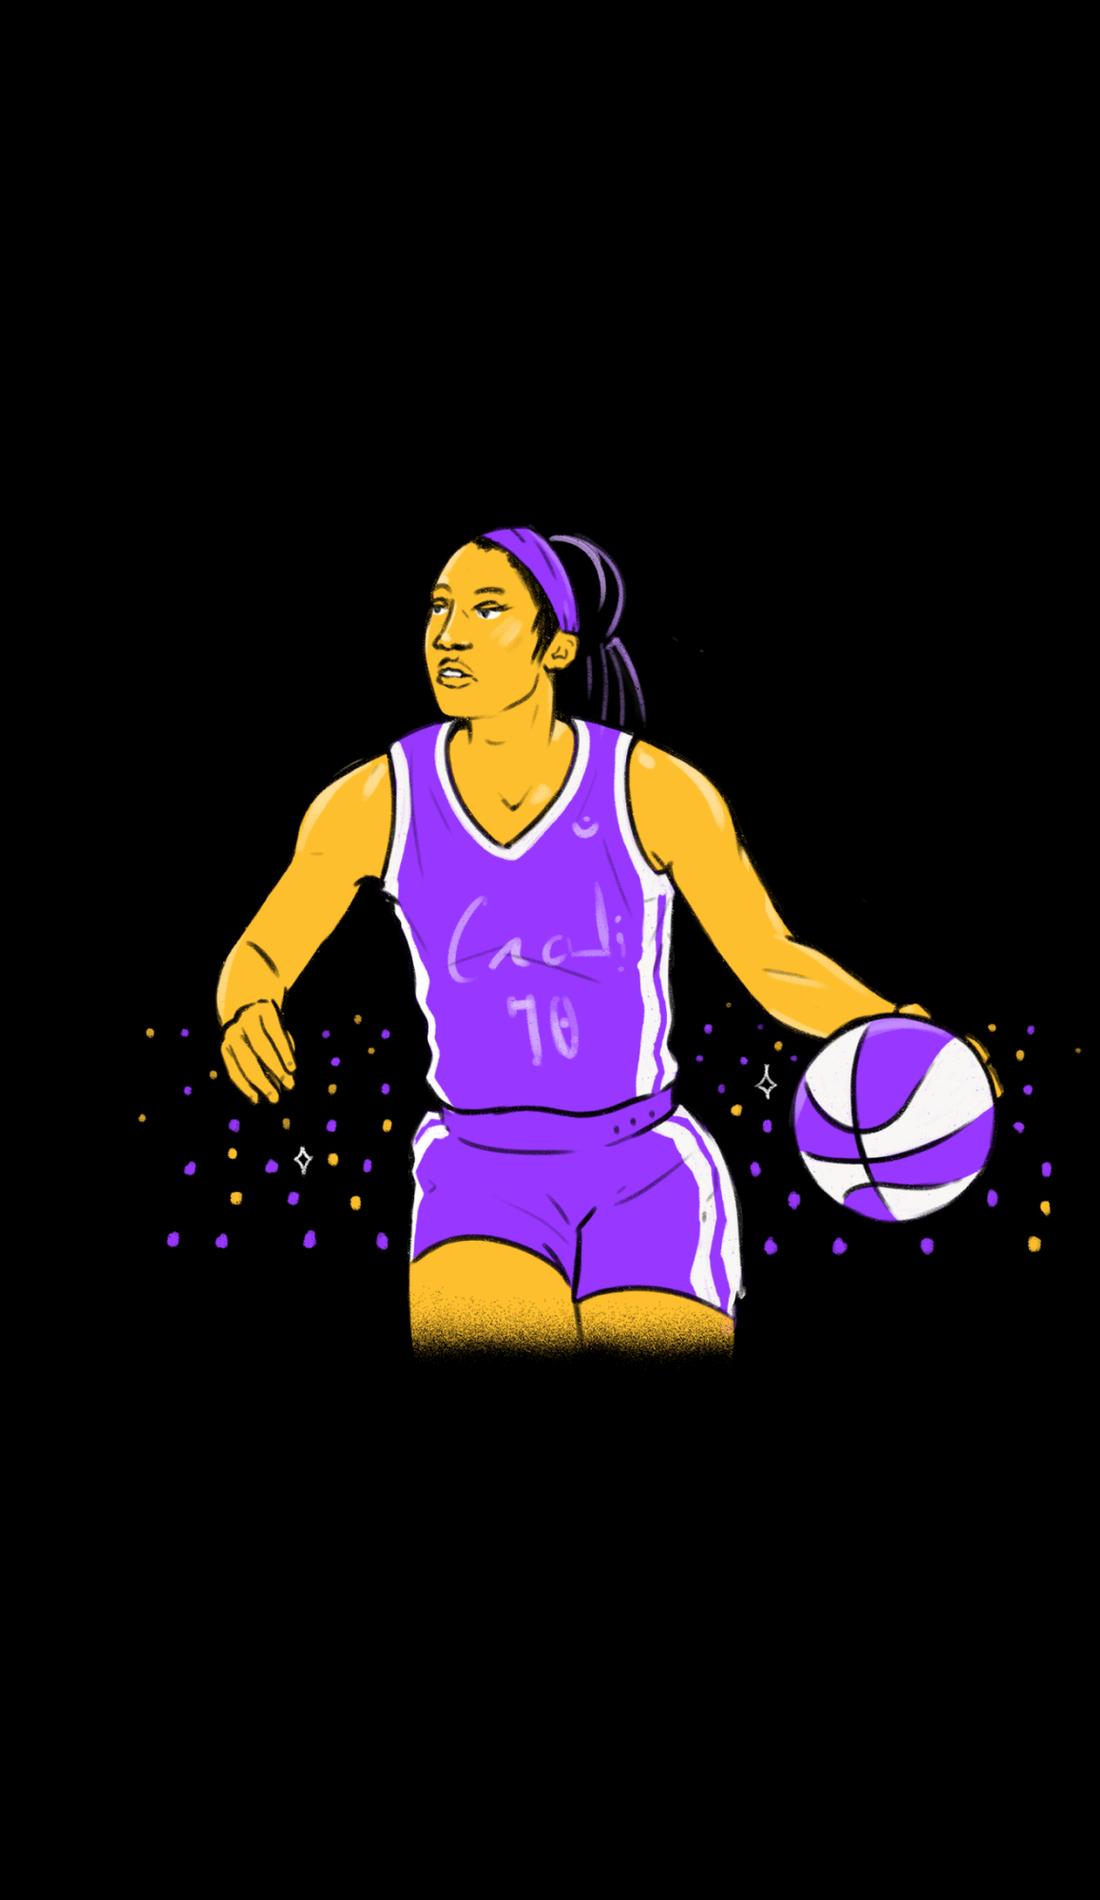 A Clemson Tigers Womens Basketball live event